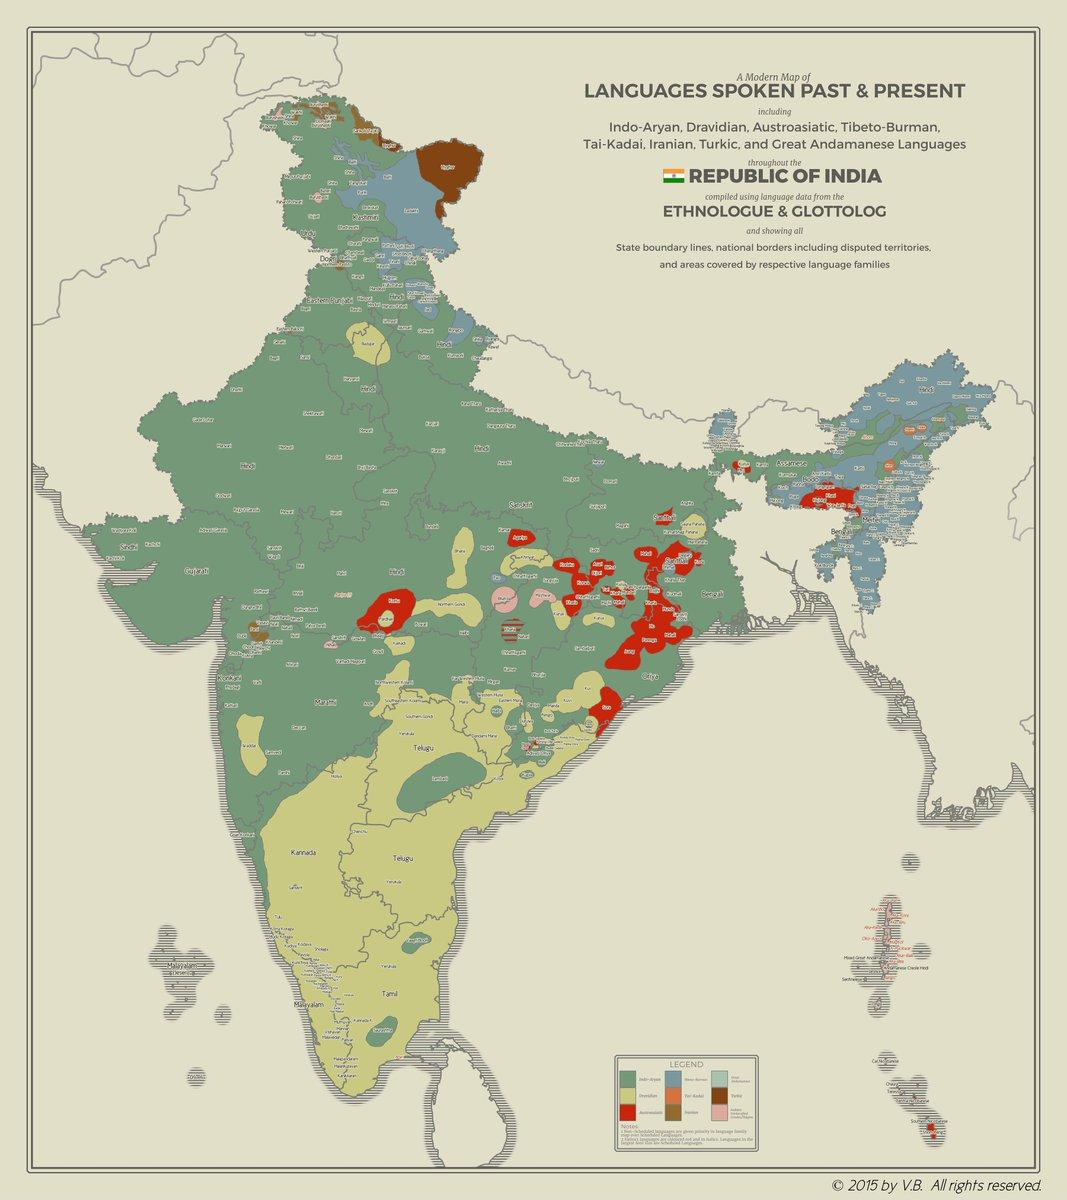 TTK Maps (@ttkmapsindia) | Twitter India Present Map on present africa map, present islam religion map, present canada map, present turkey map, present world map, present vietnam map, present china map, present greece map, present europe map, present egypt map,